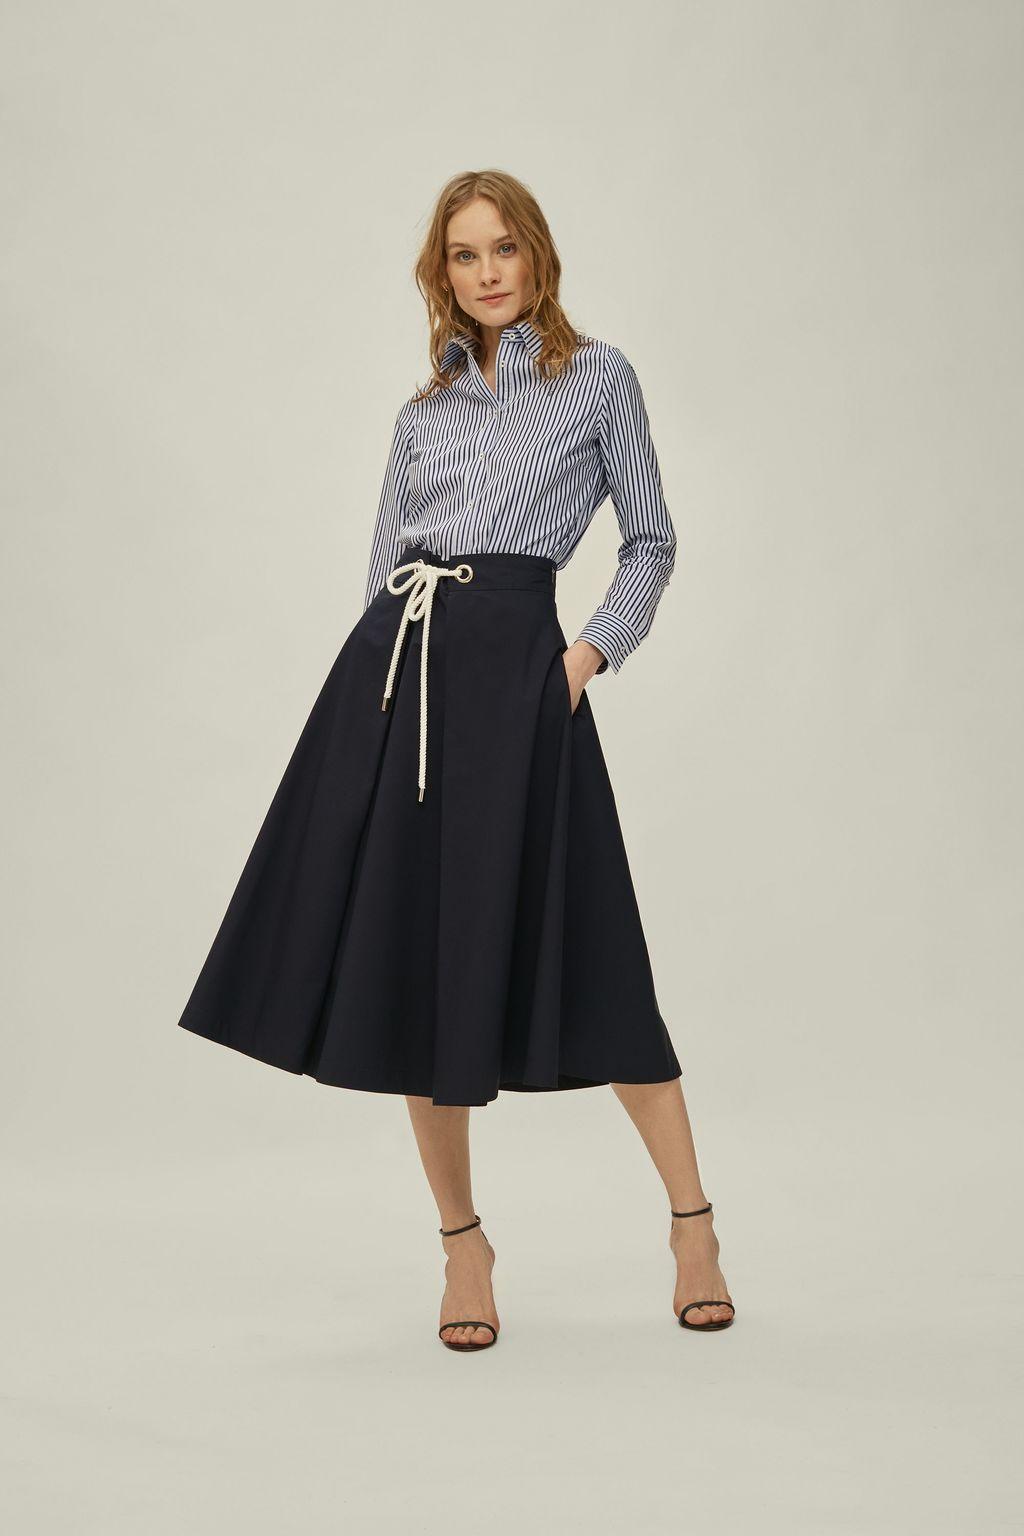 Midi skirt with ties